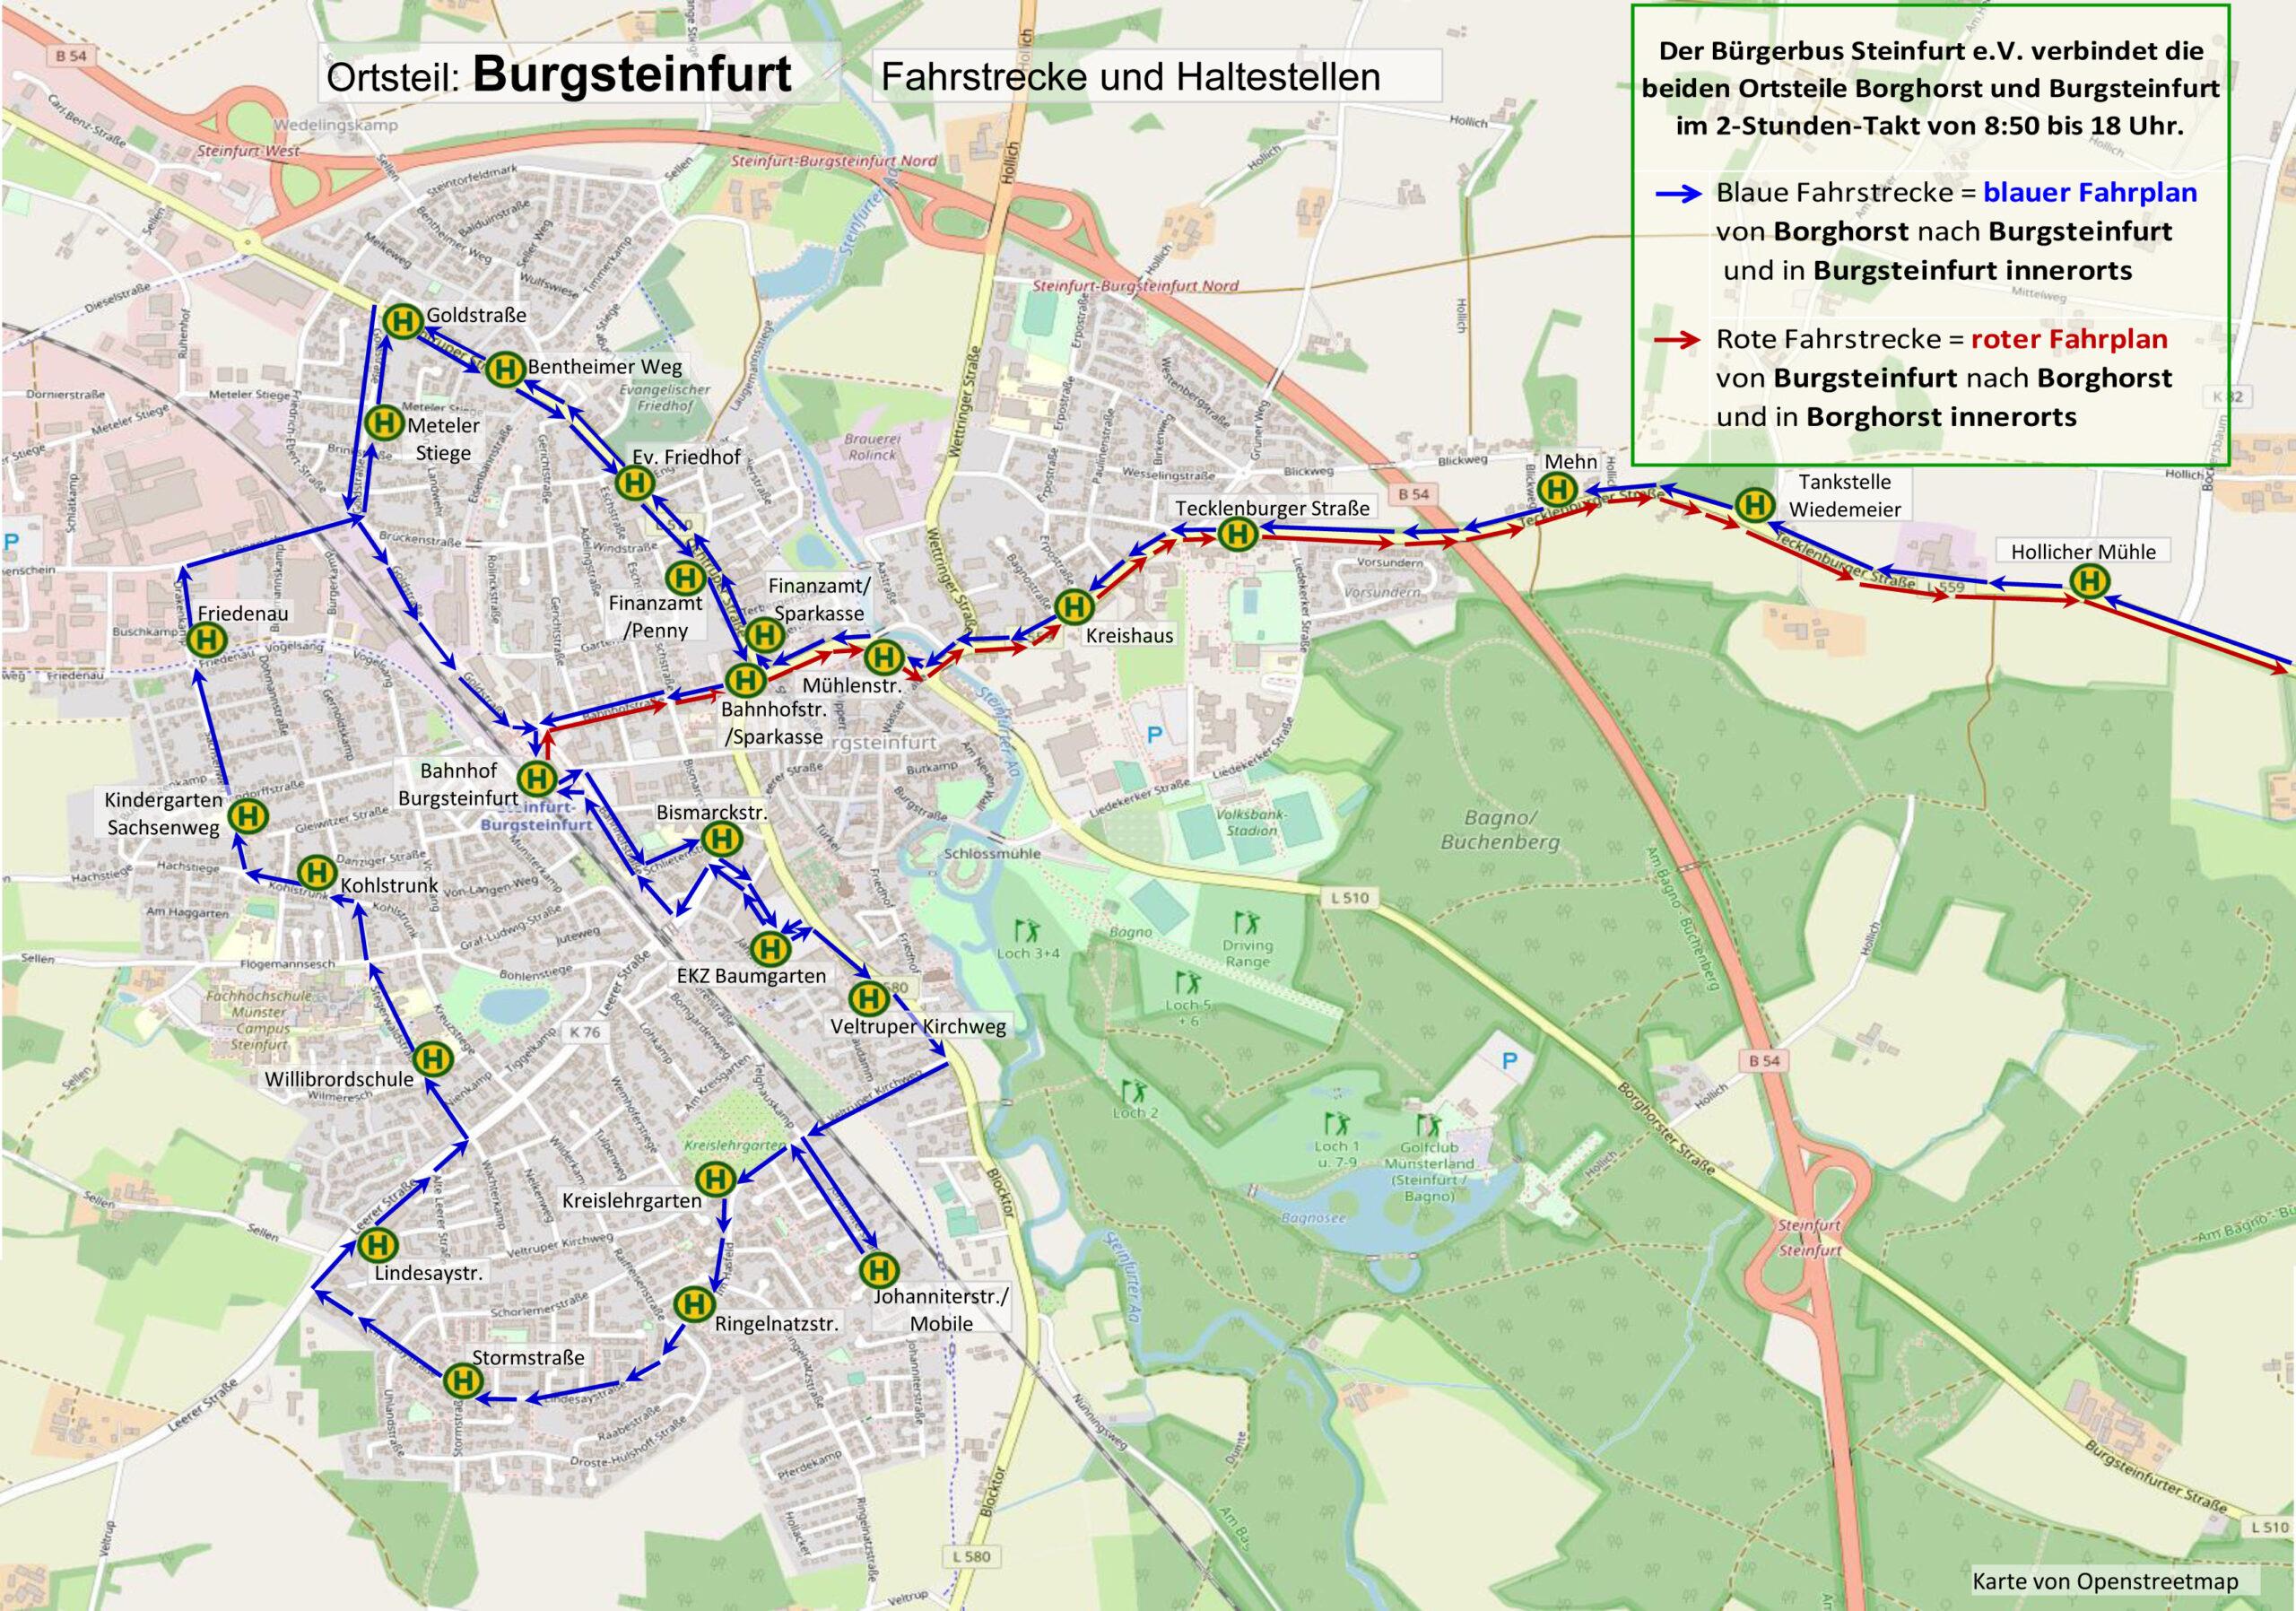 Fahrstrecke Burgsteinfurt